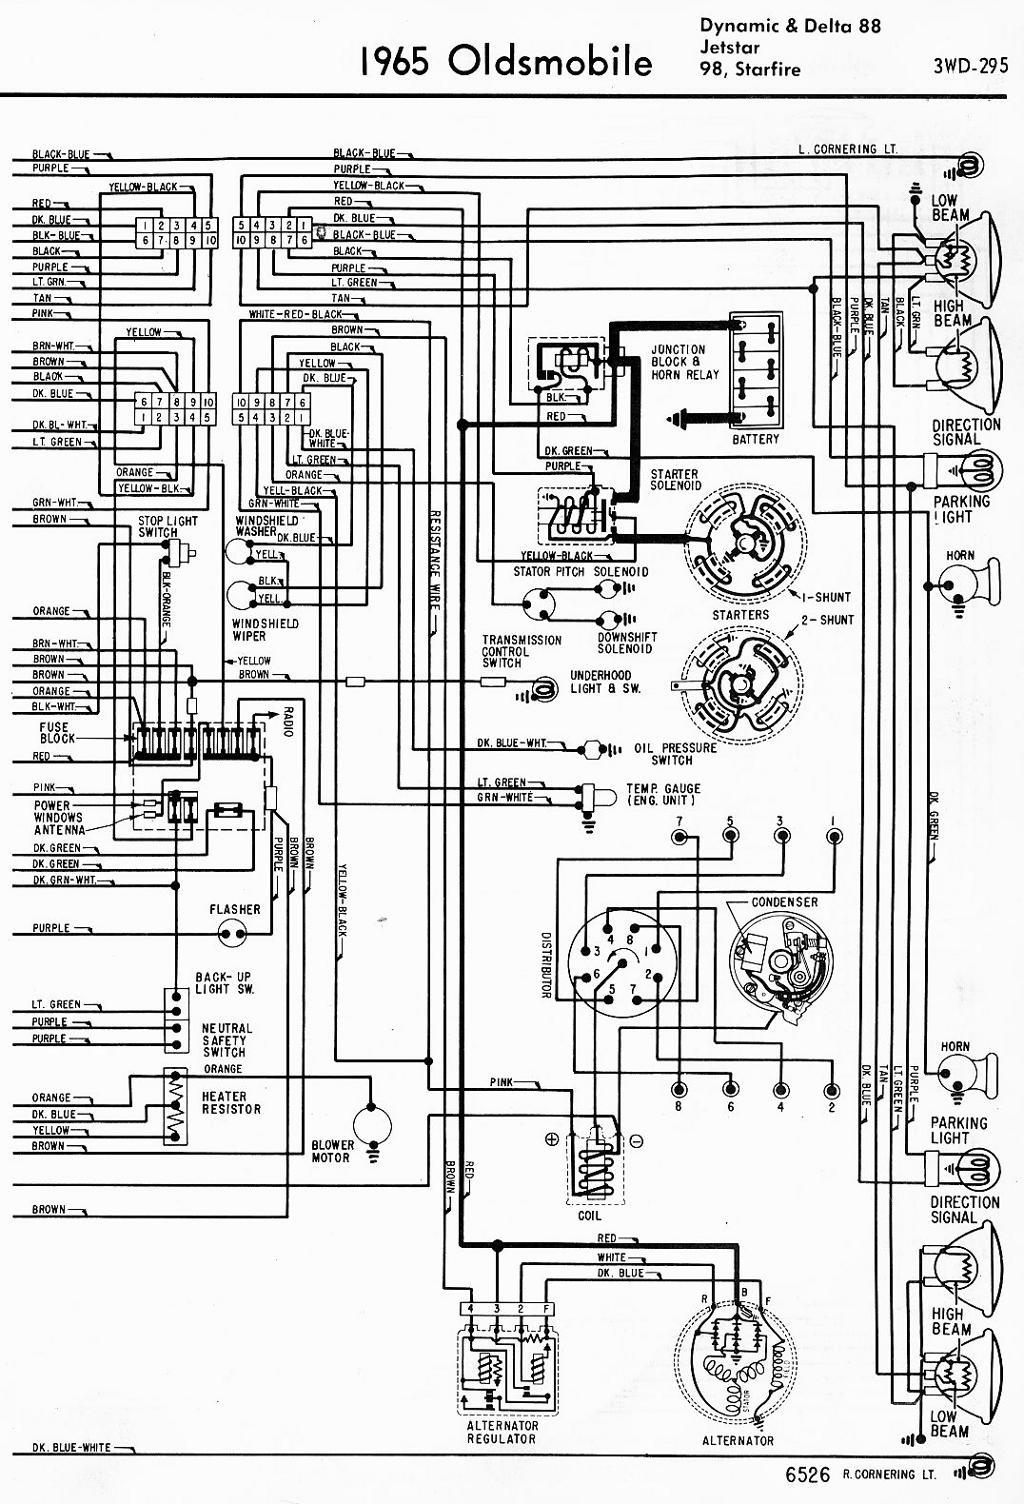 small resolution of 2008 nissan pathfinder instrument panel wiring diagram 1977 celica interior 1977 toyota celica wiring diagram